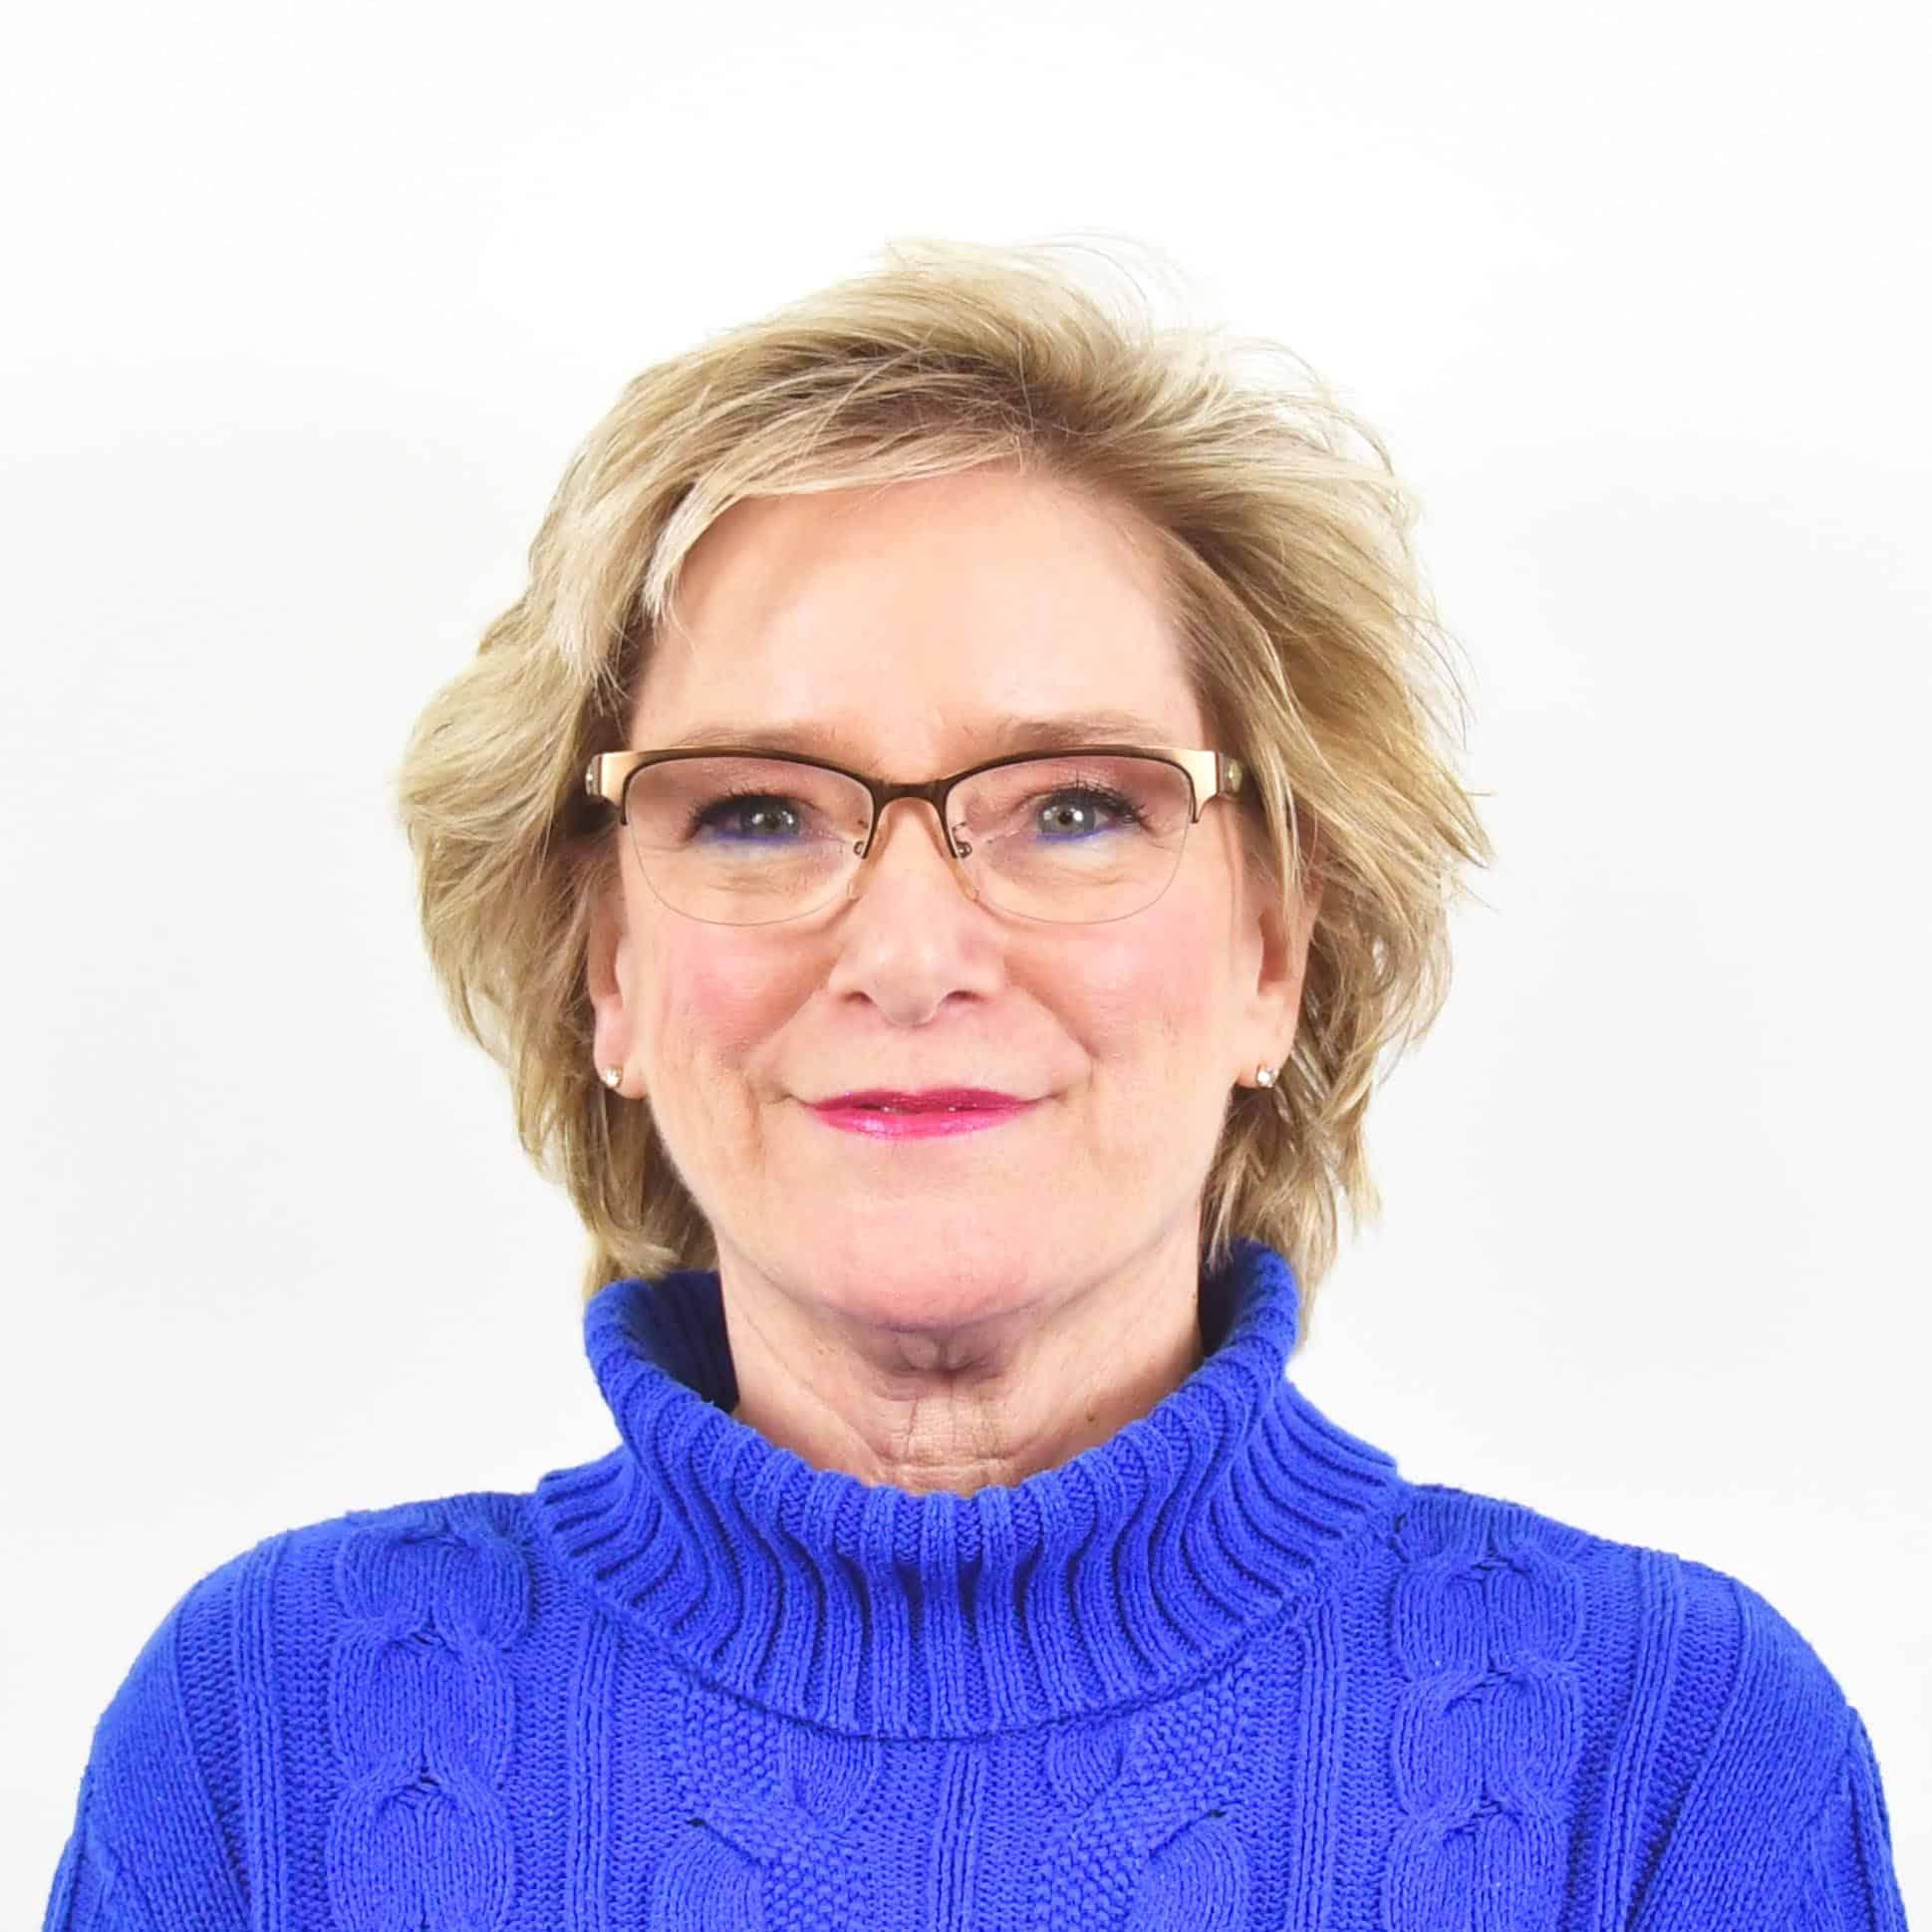 Cindy Passner